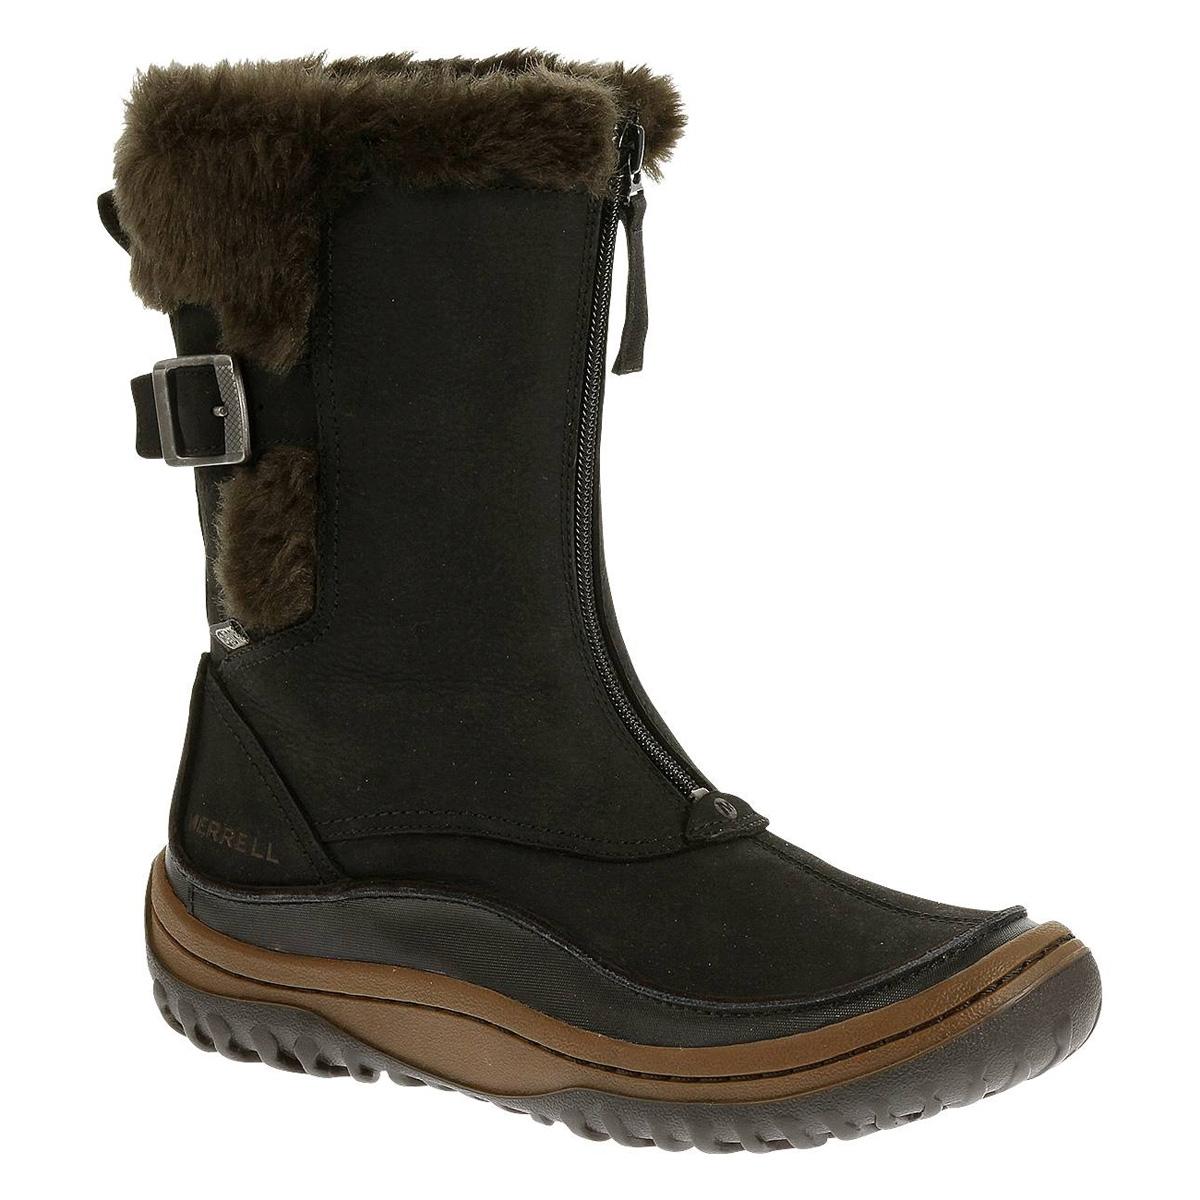 Merrell Decora Motif Waterproof Winter Boots (Women's